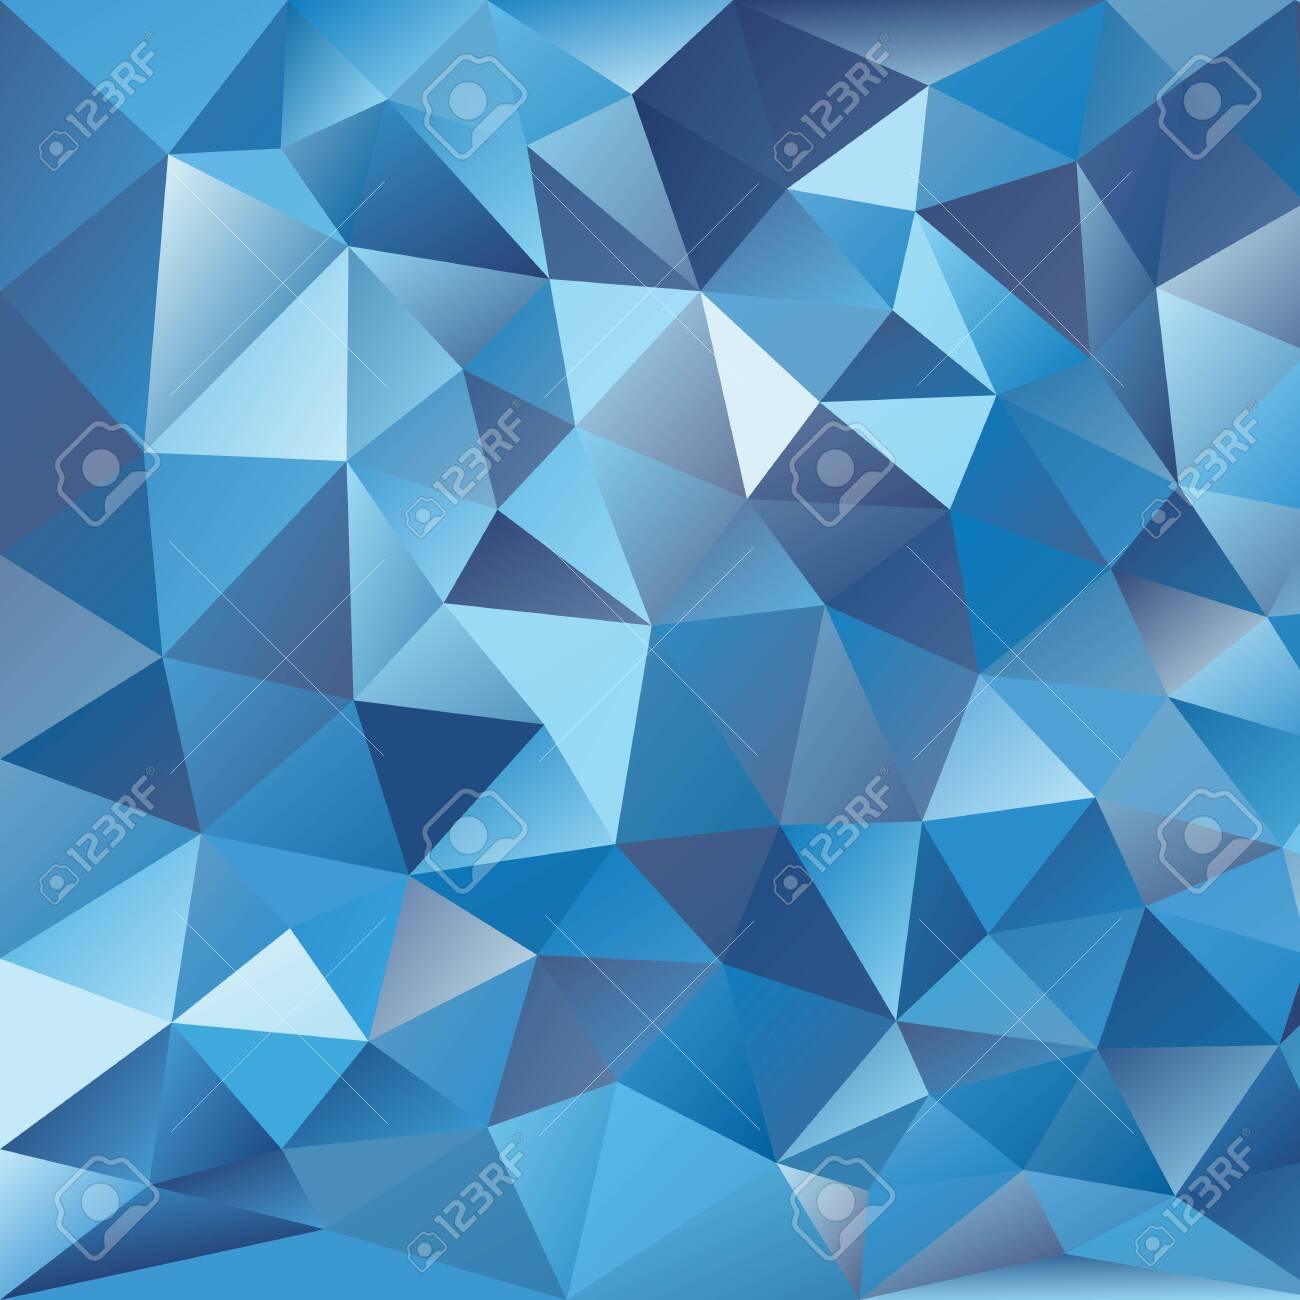 polygon Background vector illustration design template - 153377959